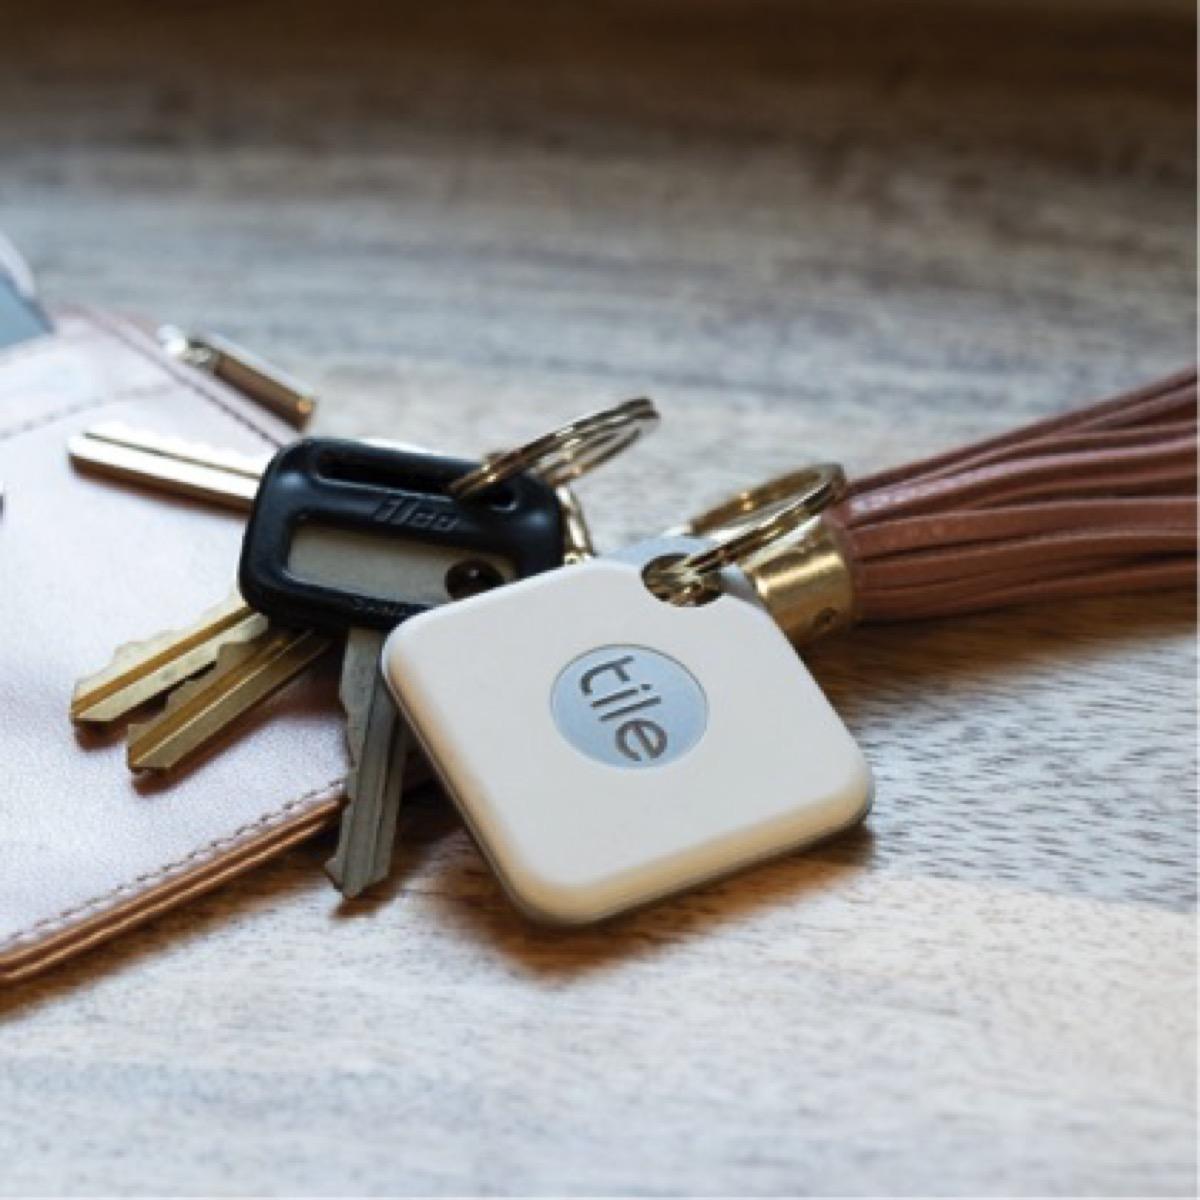 Tile with keys on keychain